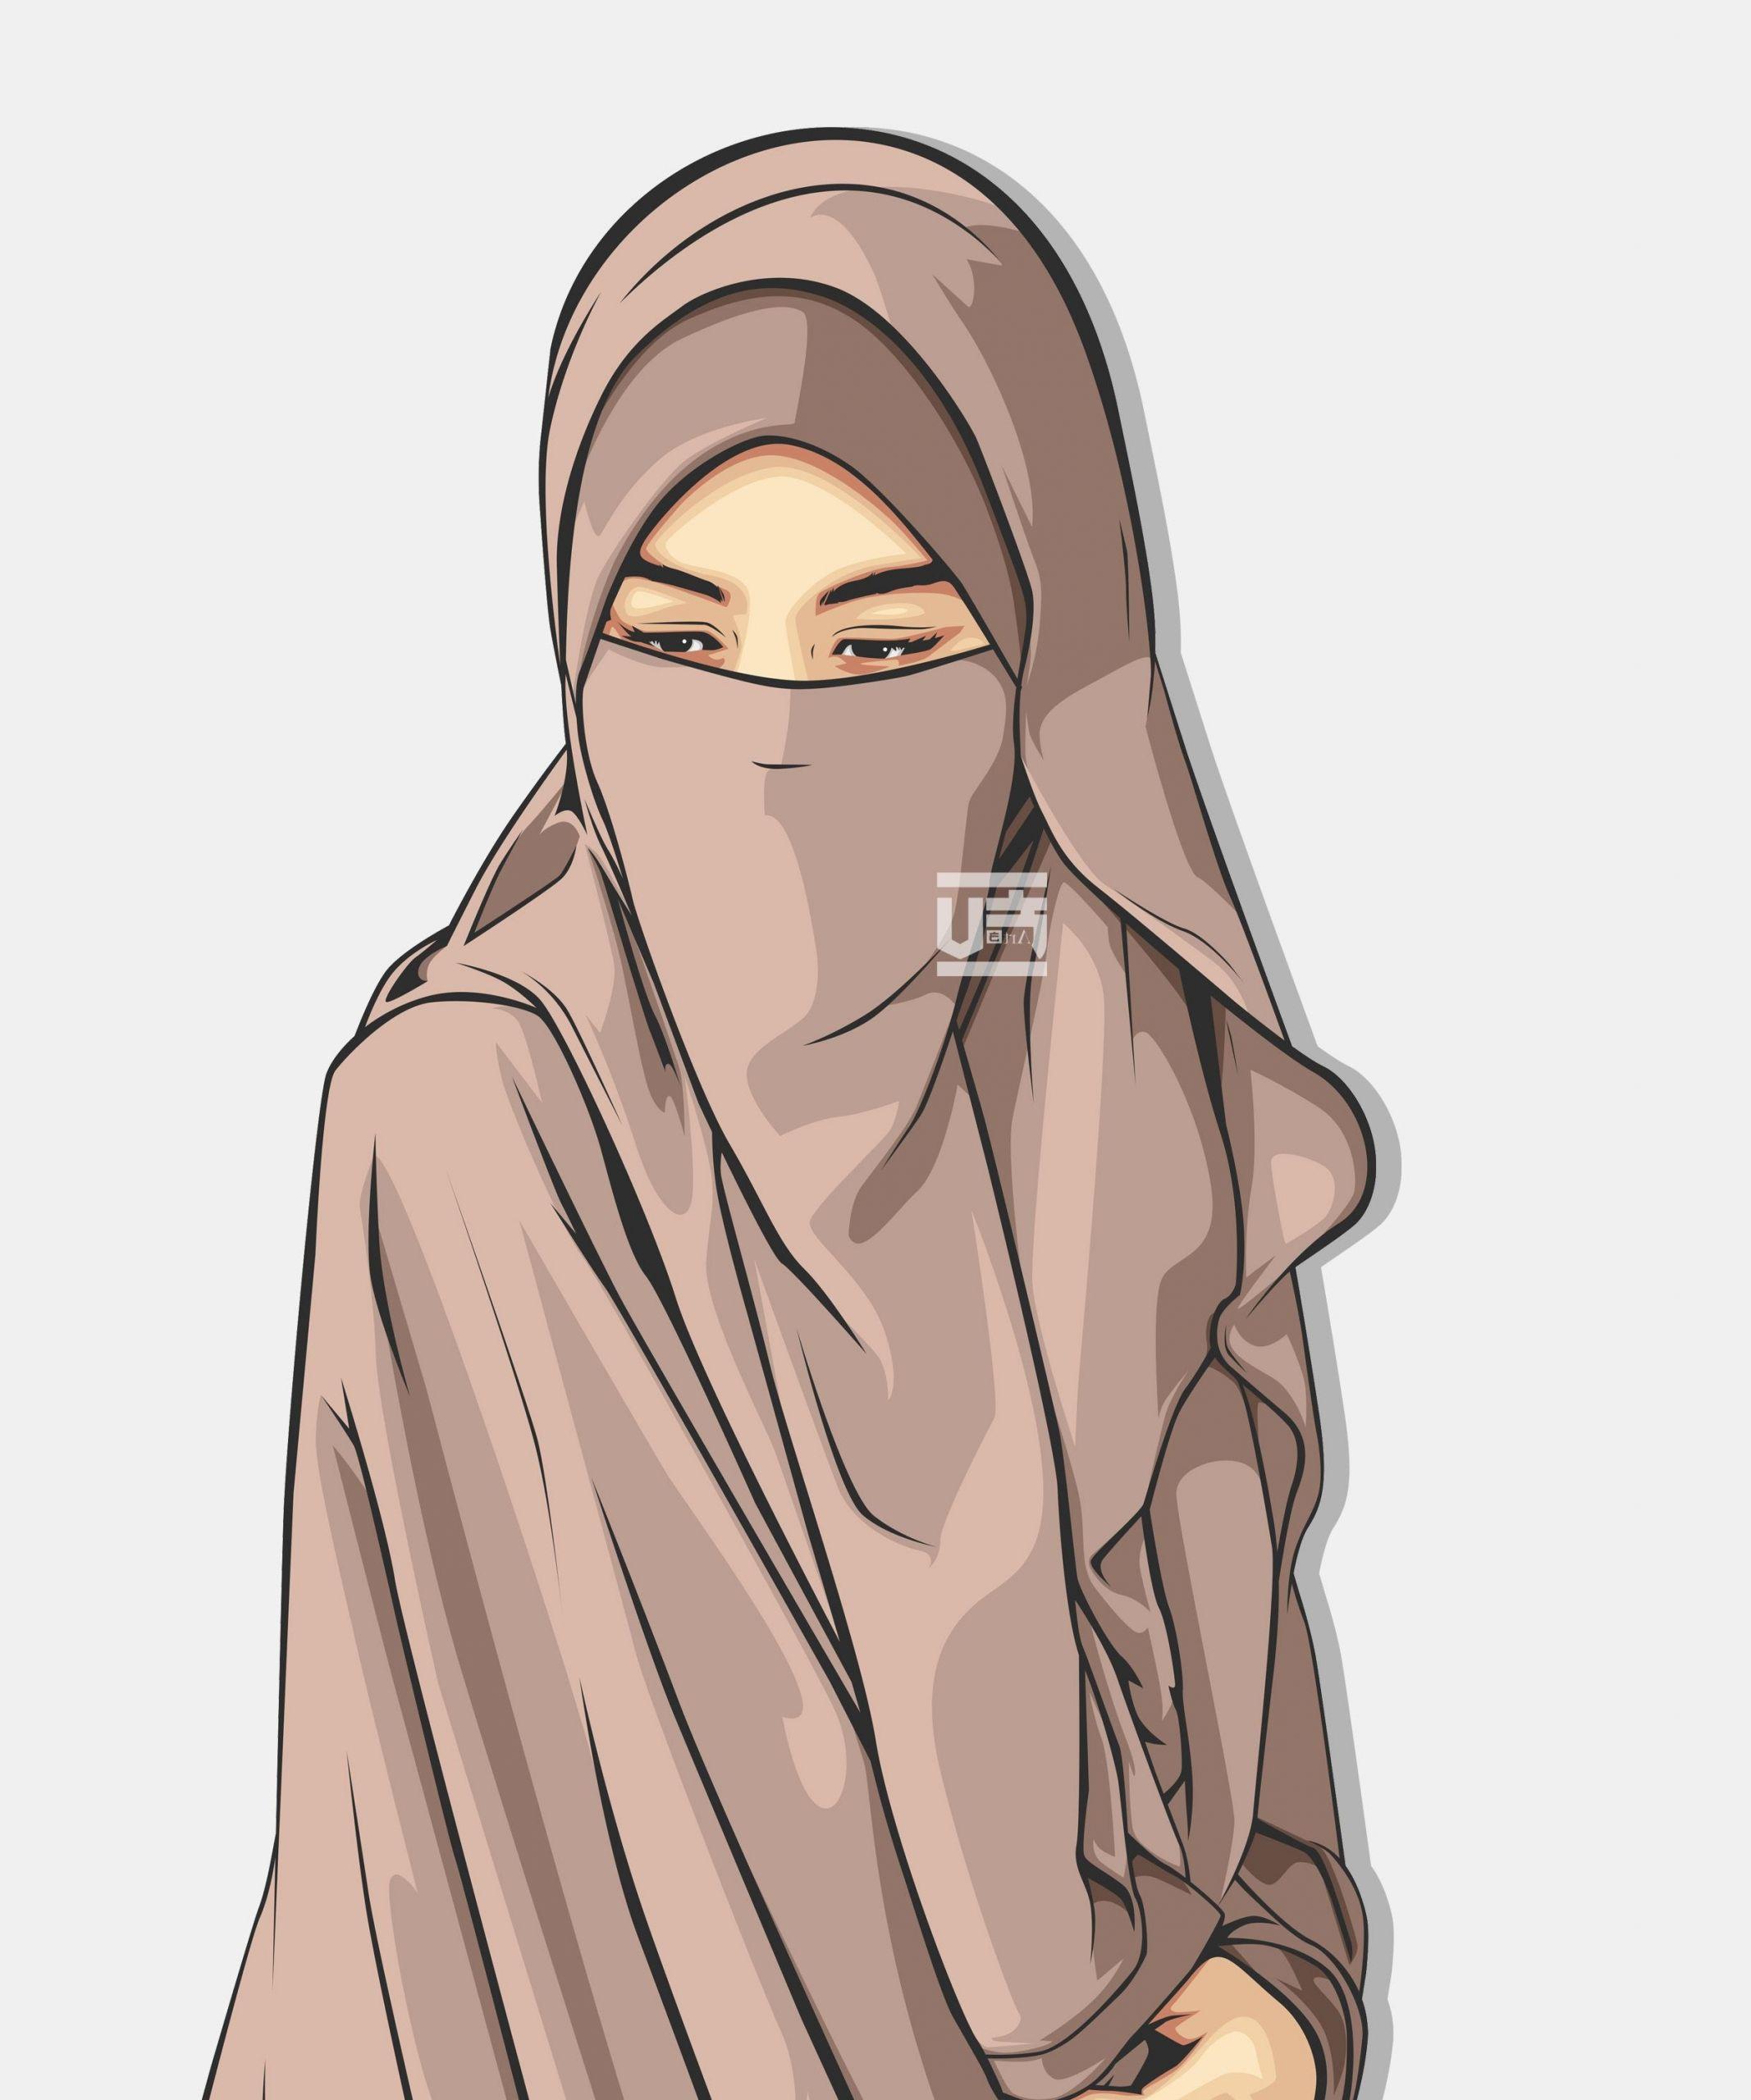 Design Muslimah Kartun Budm top Gambar Kartun Muslimah Pakai Niqab